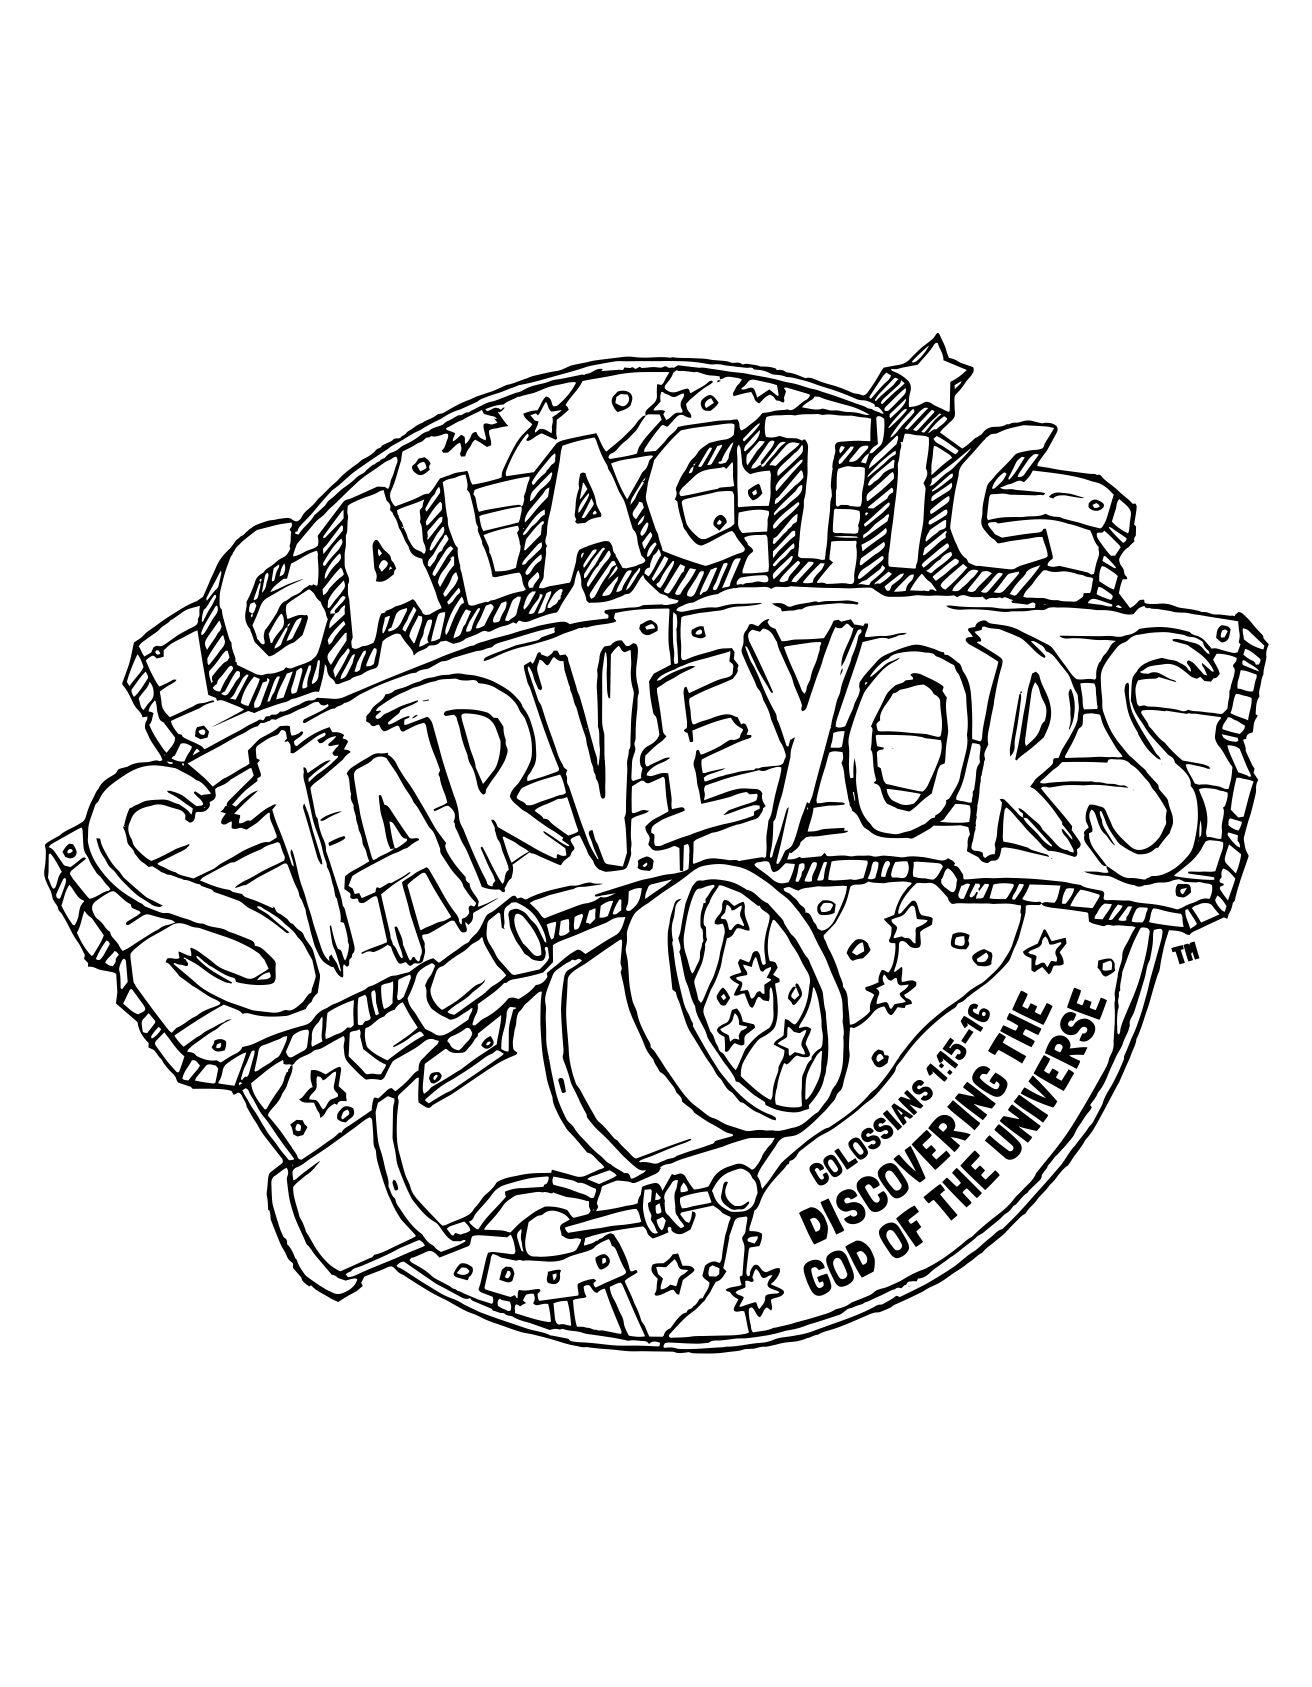 1312x1687 Galactic Starveyors Coloring Sheet Vbs Day Vbs